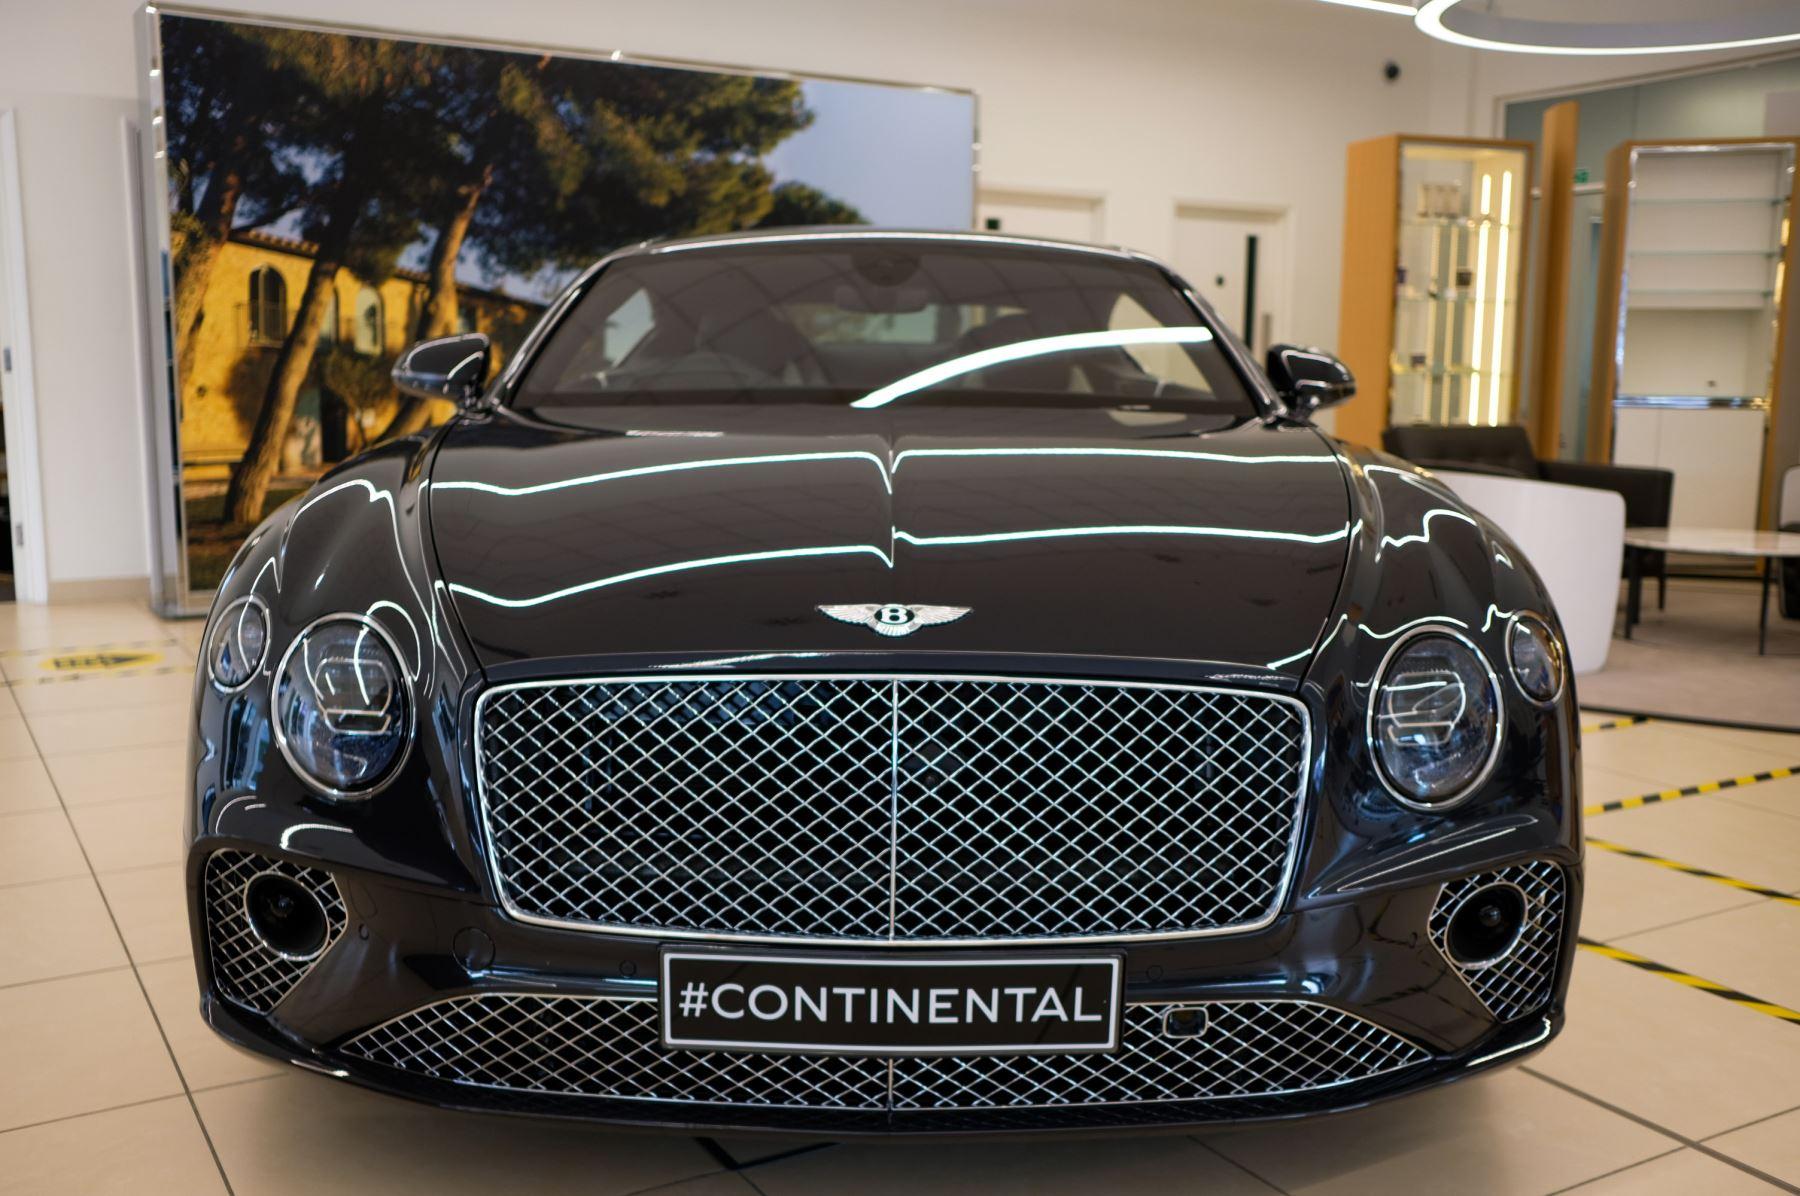 Bentley Continental GT 4.0 V8 2dr Auto image 2